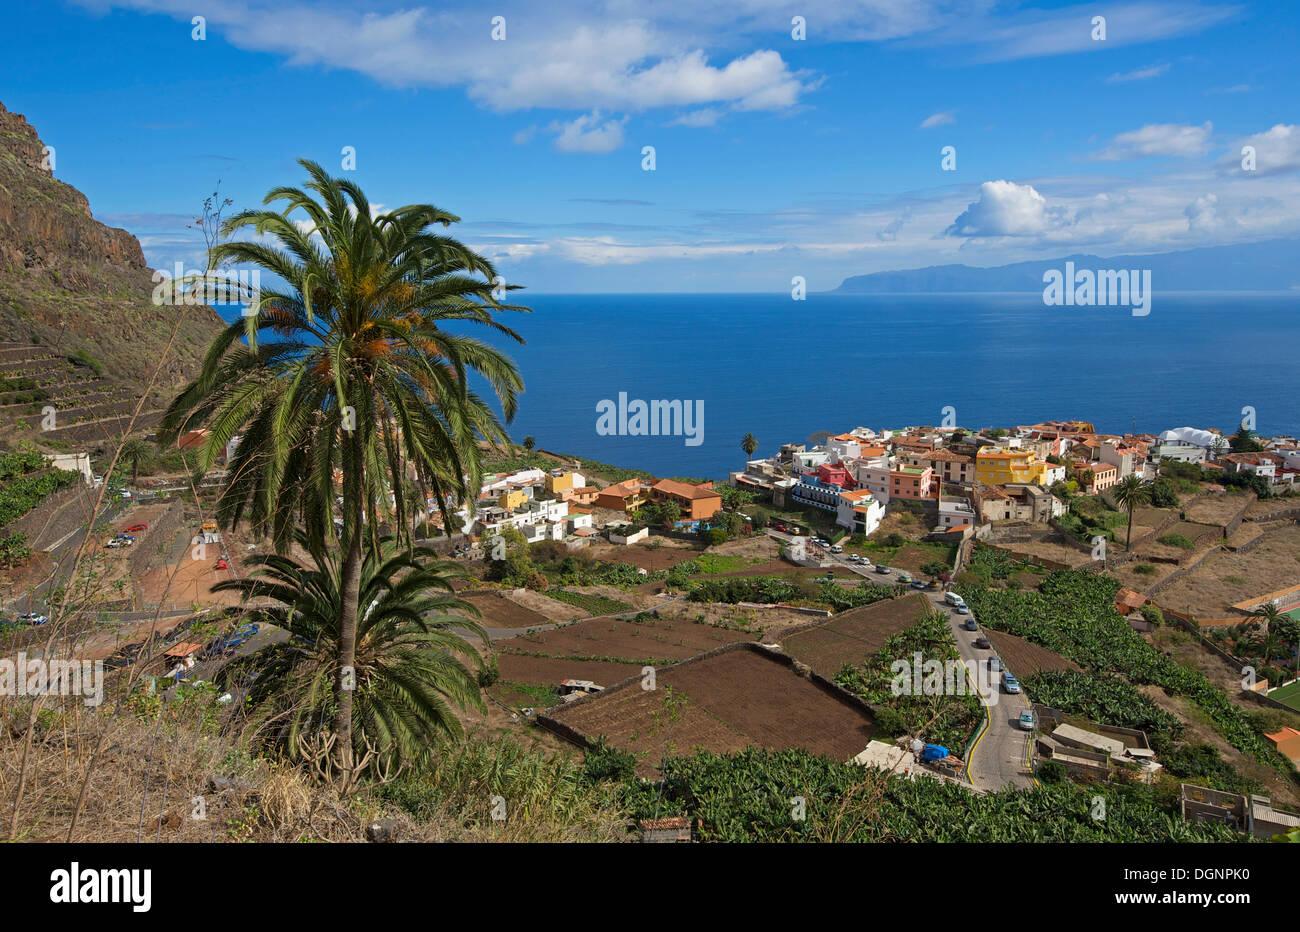 Stadtbild, Agulo, La Gomera, Kanarische Inseln, Spanien Stockbild